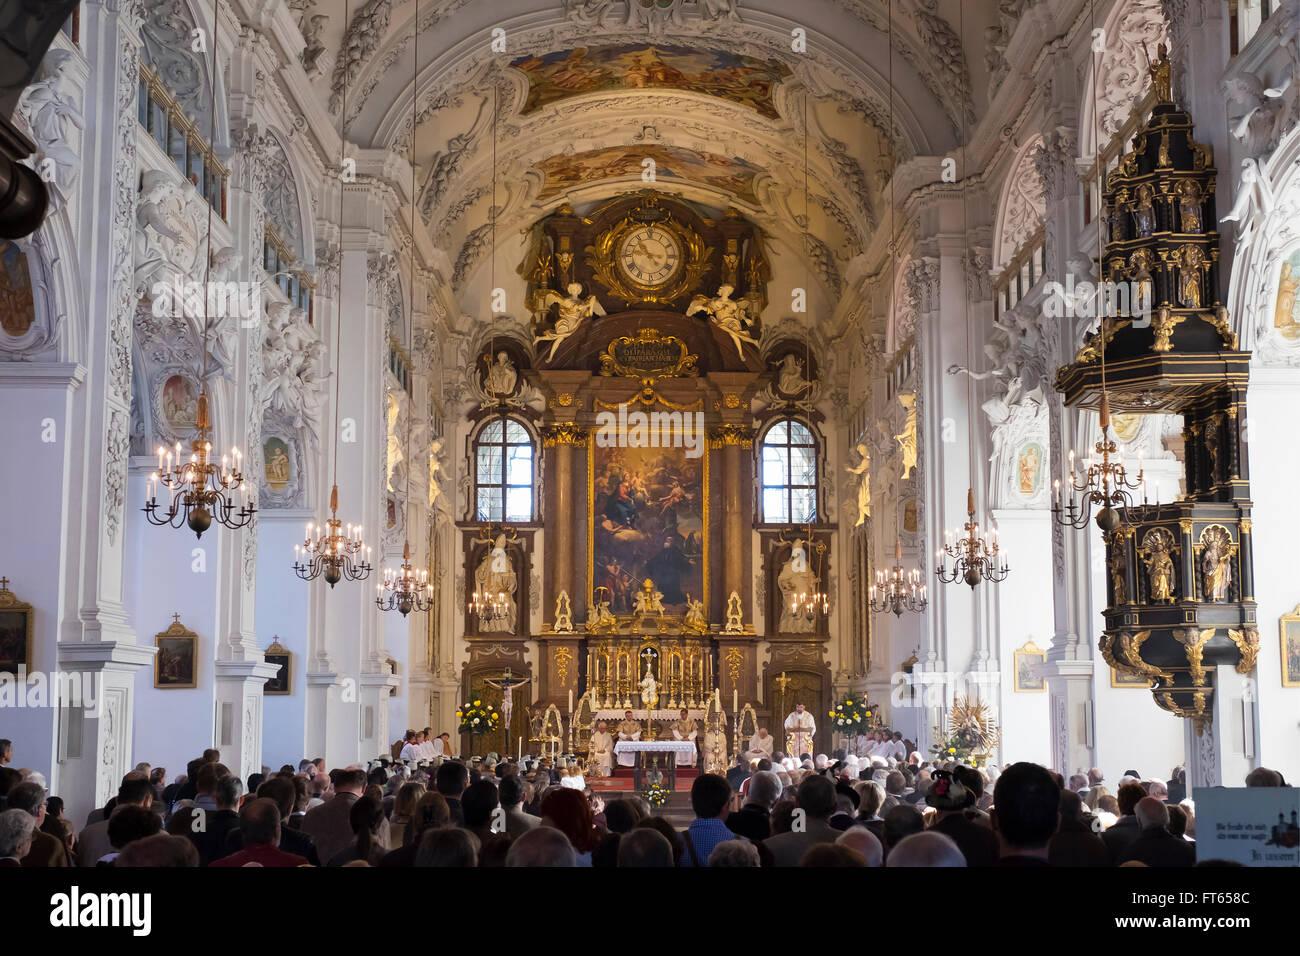 Leonhardi mass at the Basilica of St. Benedict, Benediktbeuern, Upper Bavaria, Bavaria, Germany - Stock Image